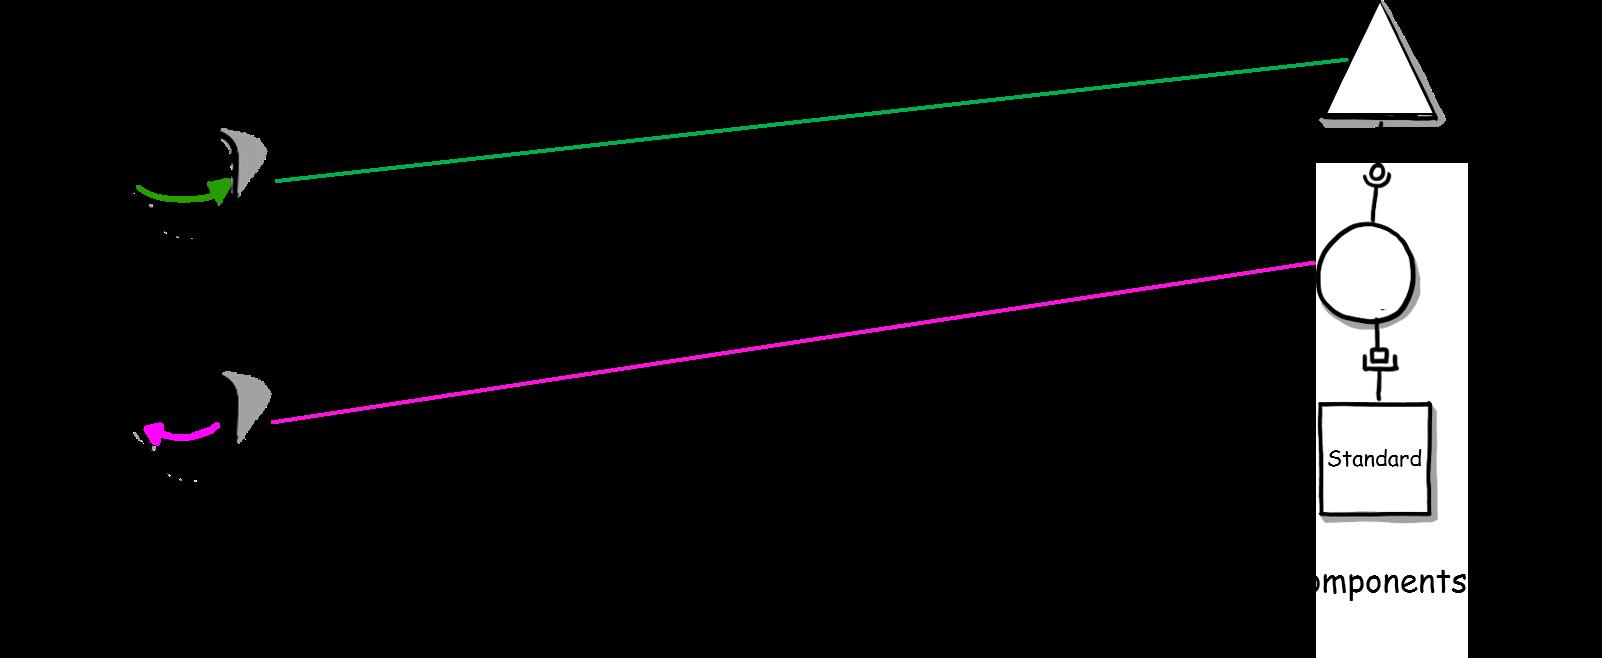 modular-system_with_modularization